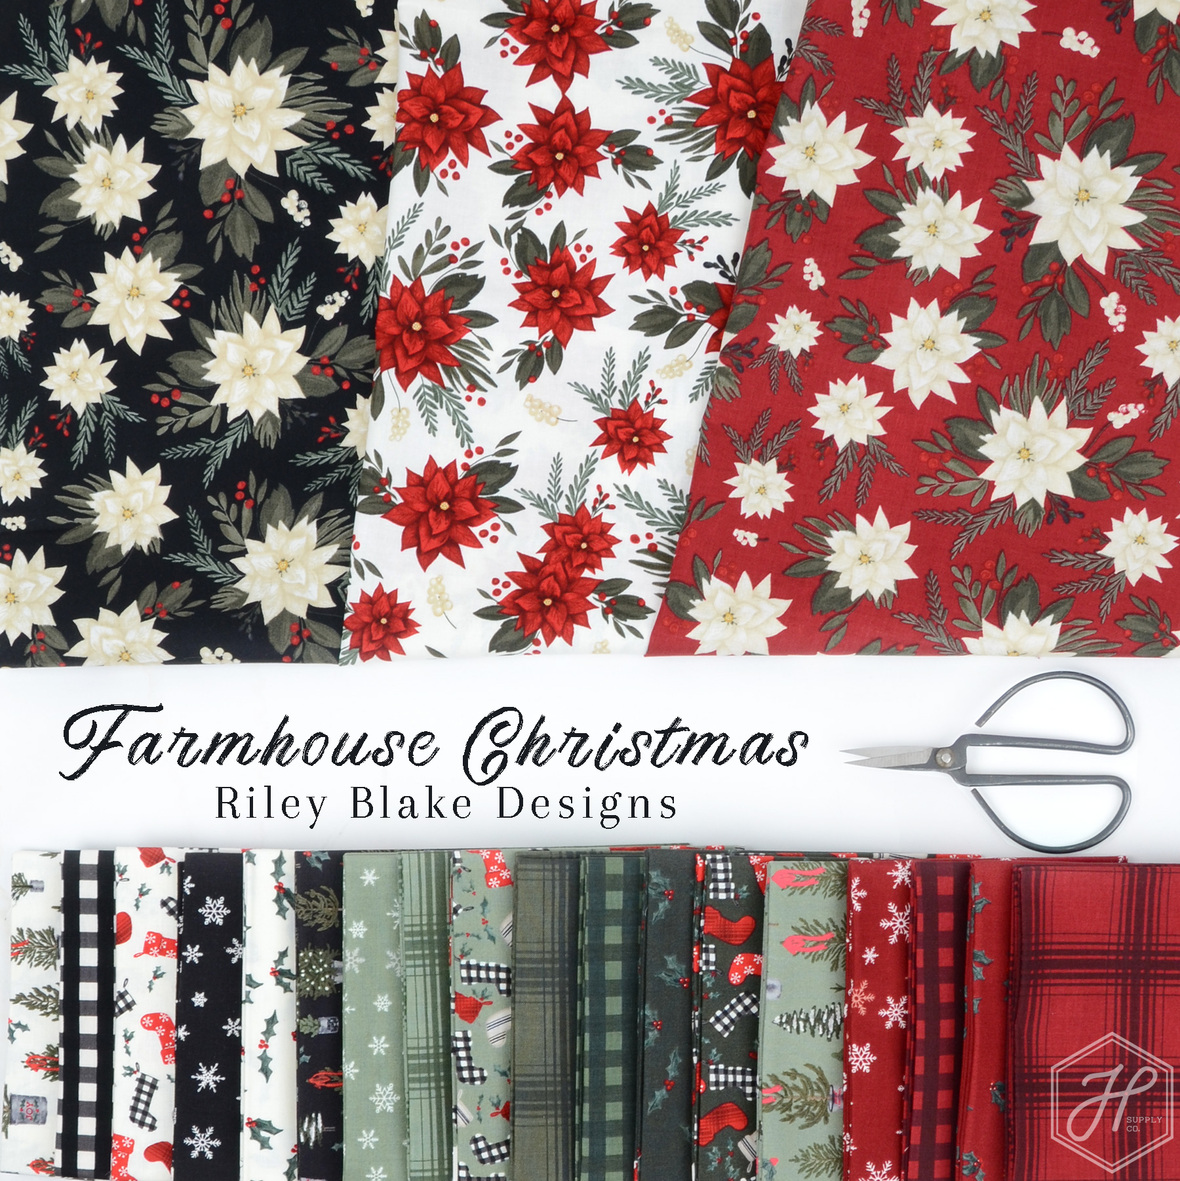 Farmhouse-Christmas-Fabric-Riley-Blake-at-Hawthorne-Supply-Co